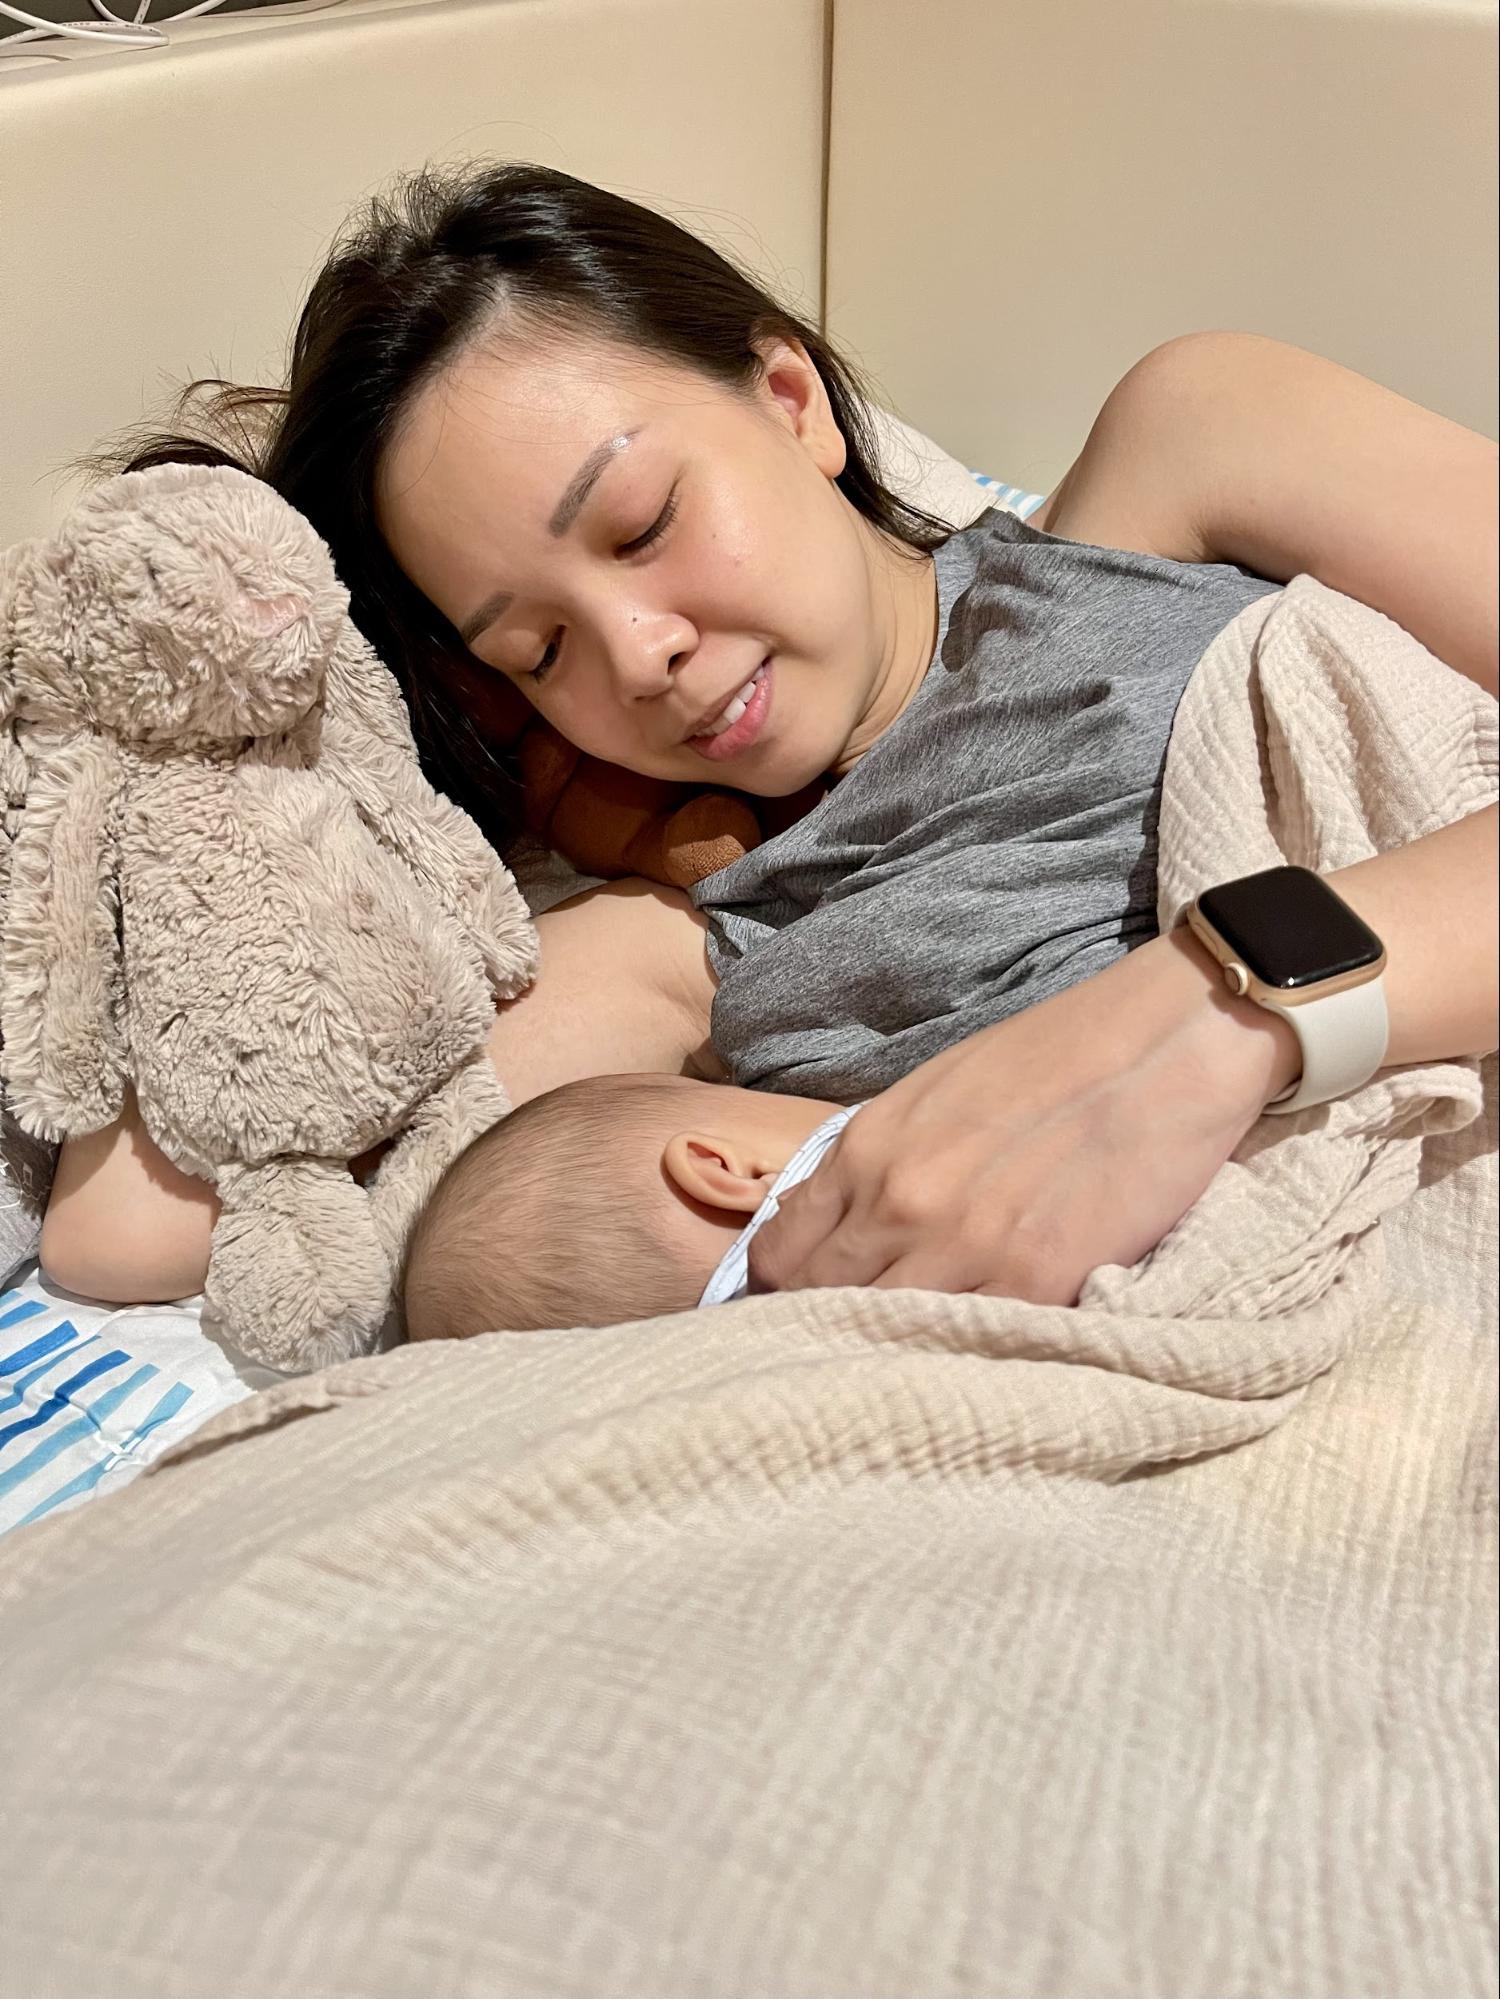 breastfeeding singapore - Latch and pump